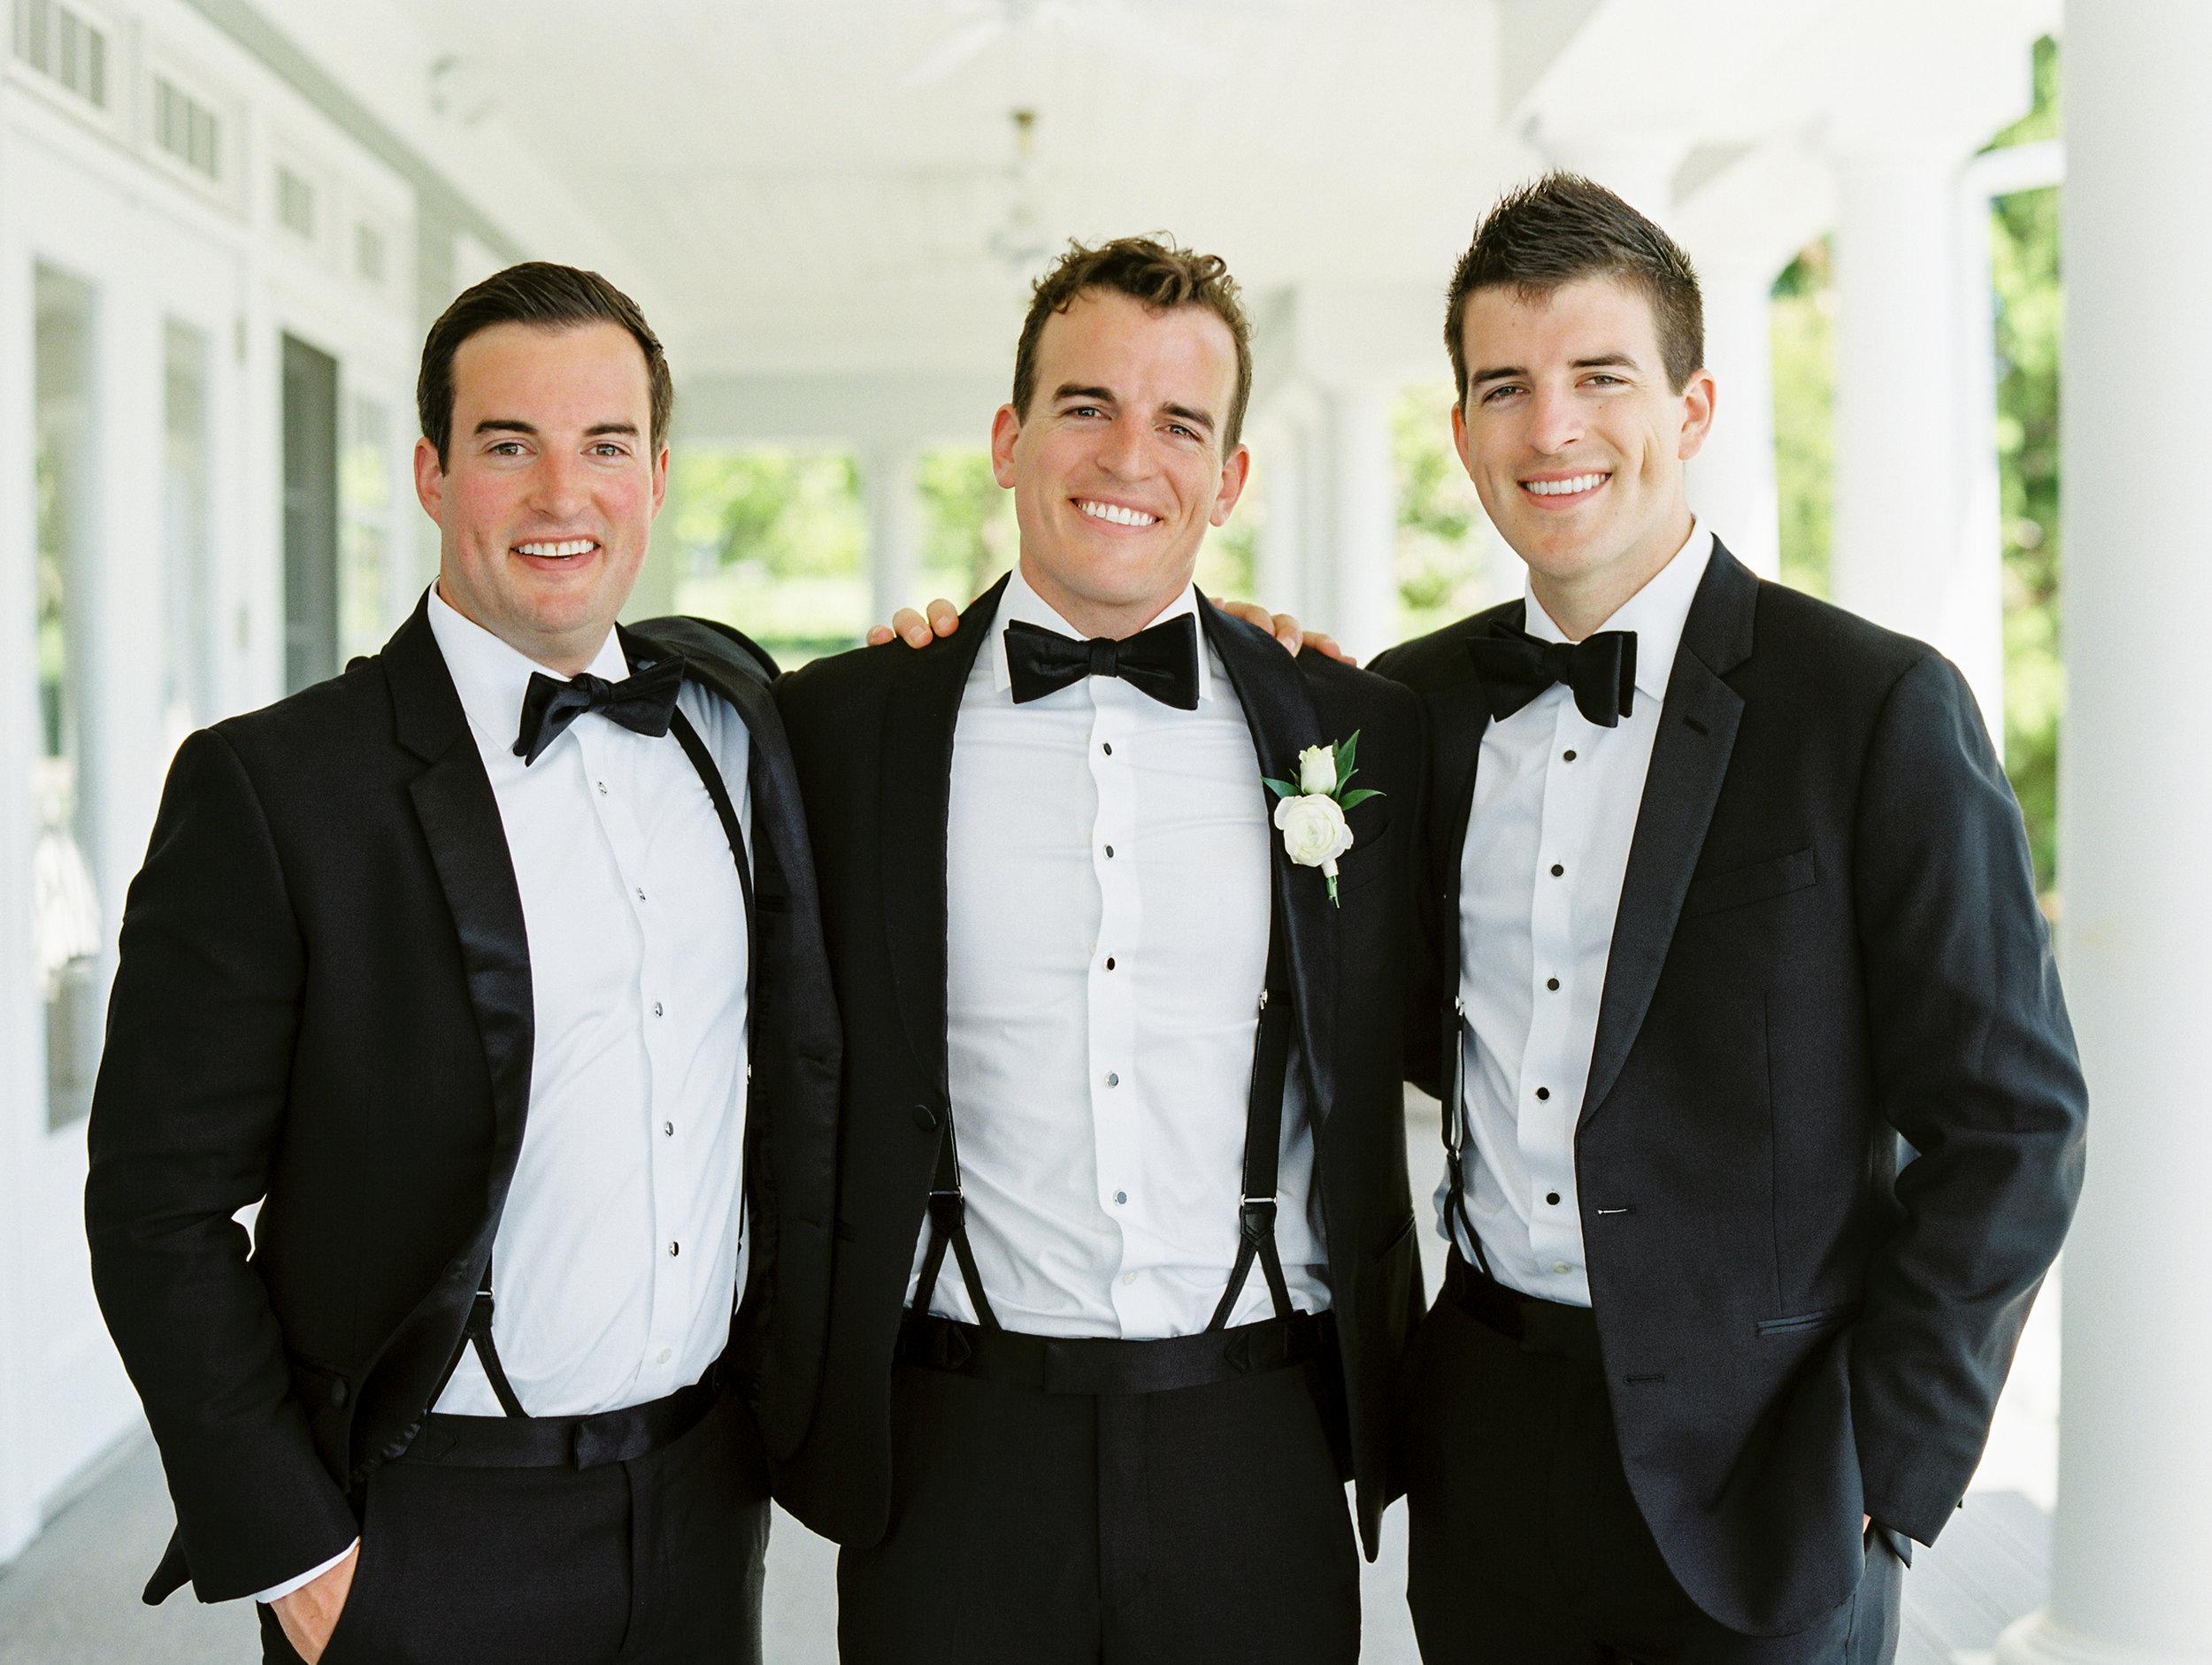 DeGuilio+Wedding+Bridal+Partyf-19.jpg